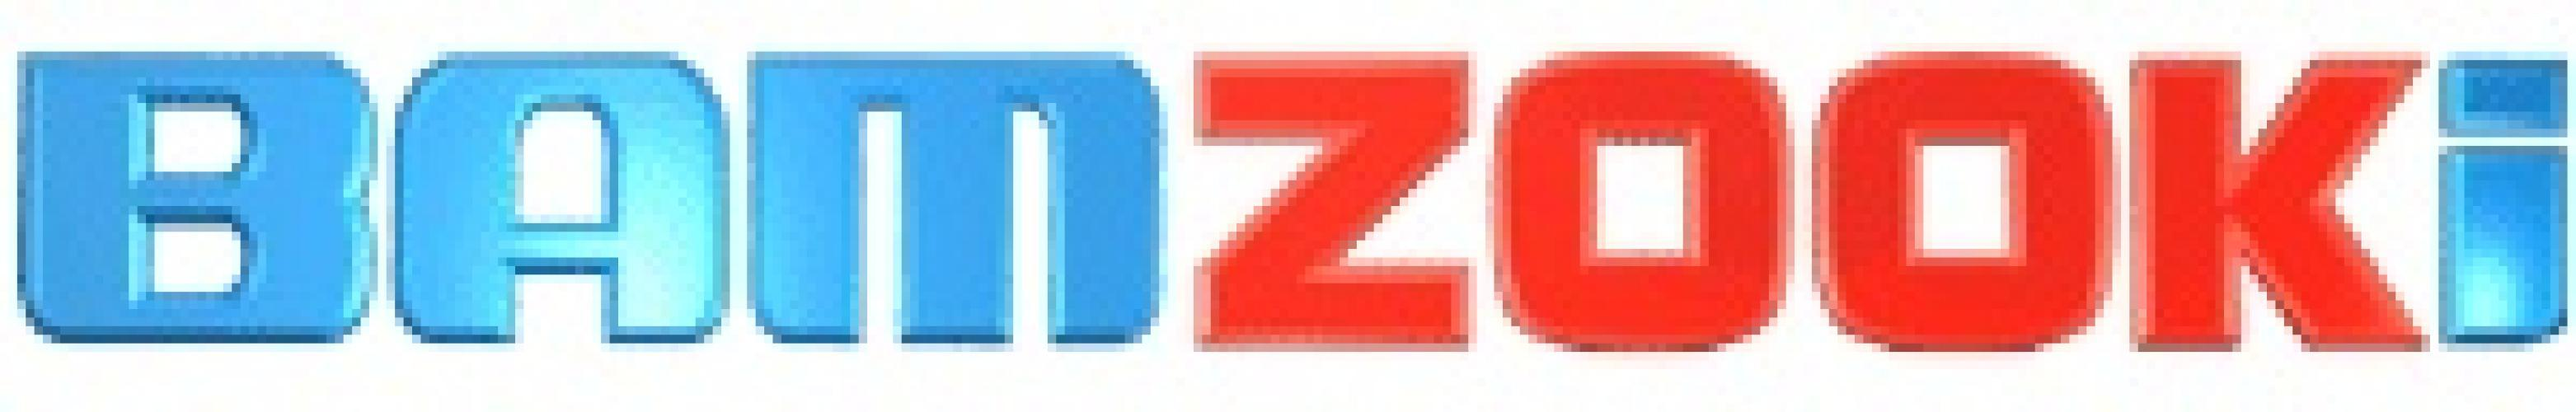 Bamzooki next episode air date poster